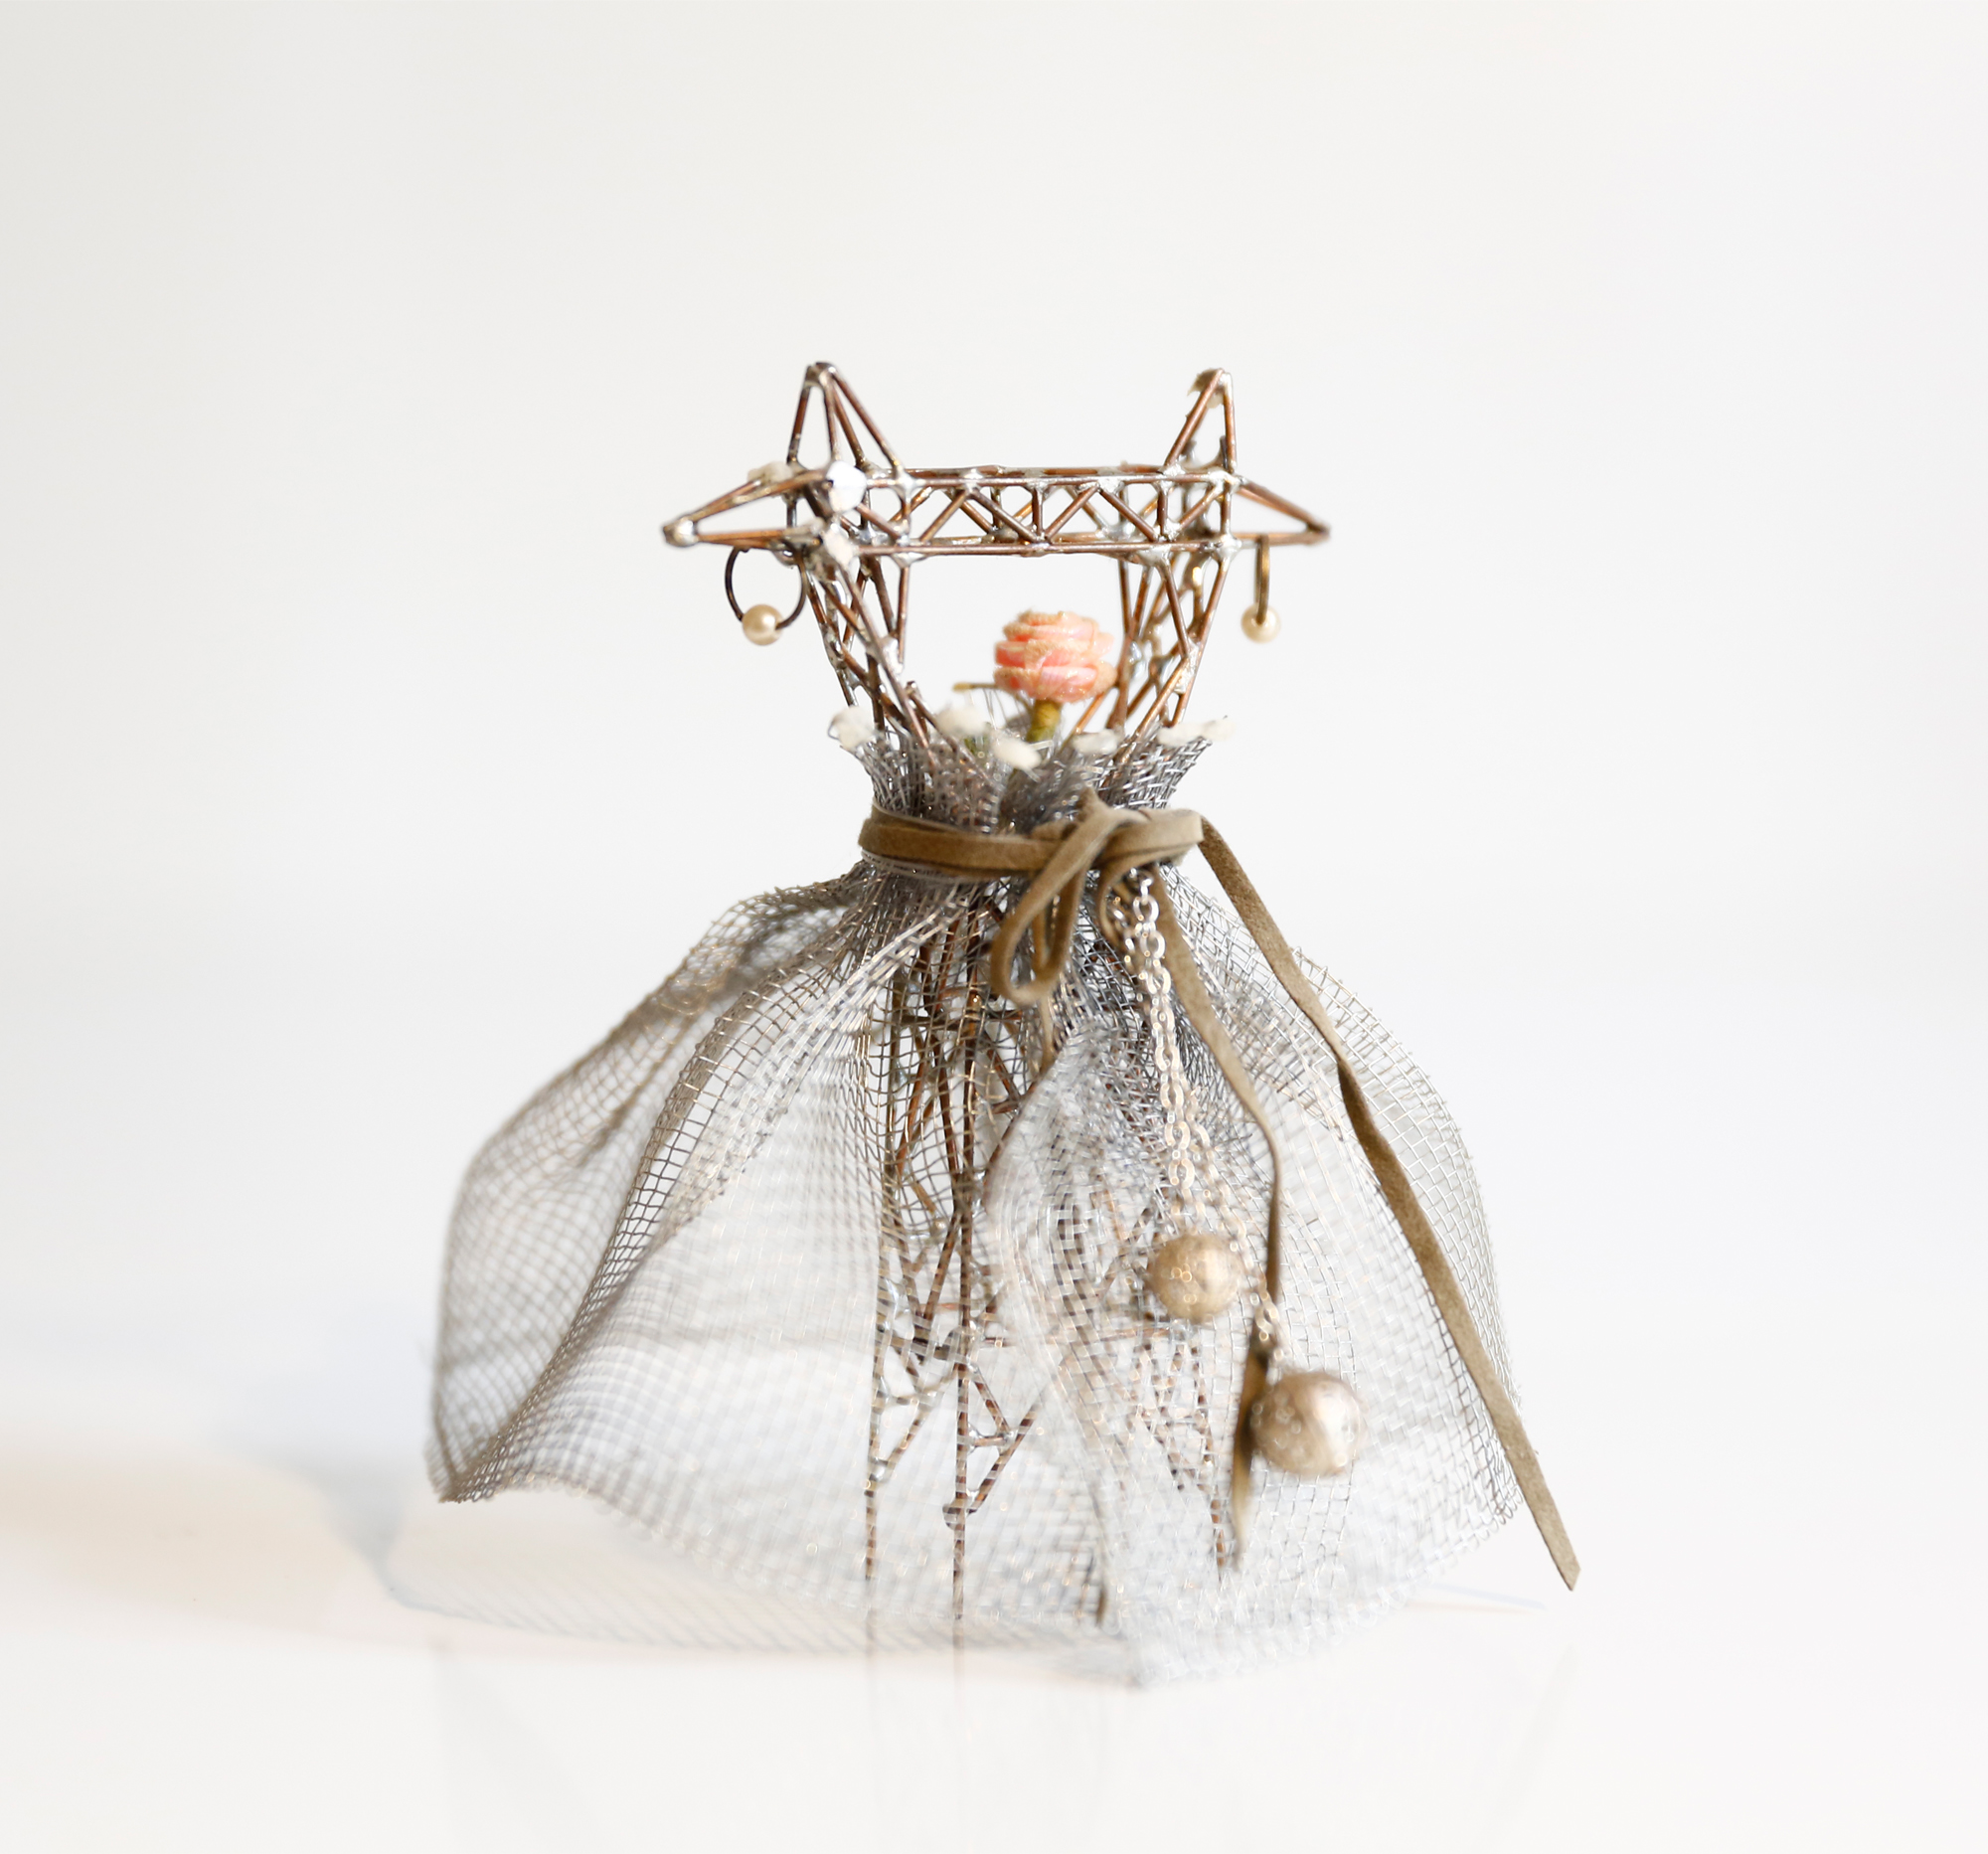 Mini Pylon in Gown